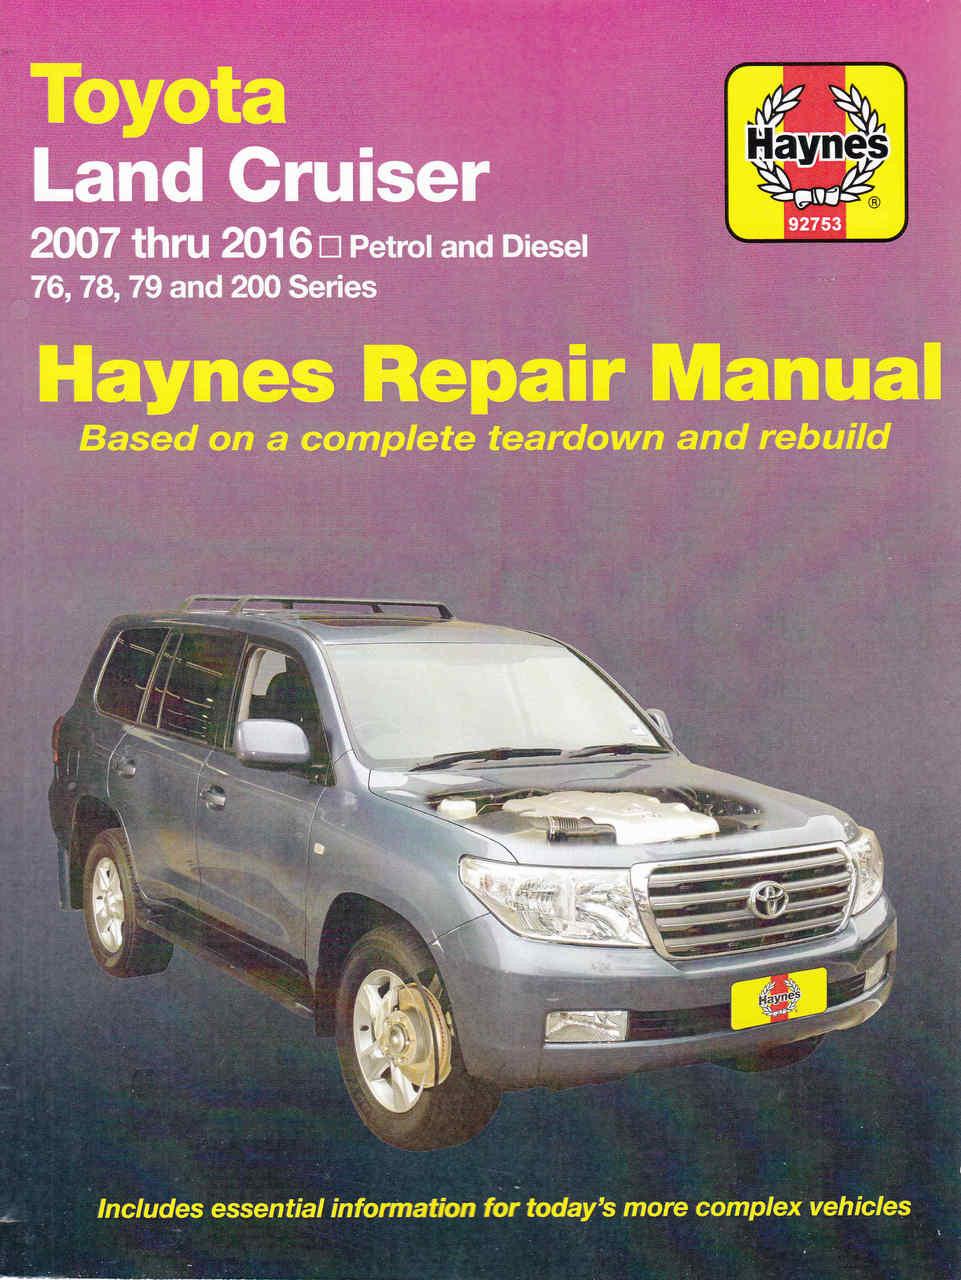 medium resolution of toyota land cruiser 76 78 79 and 200 series petrol diesel 2007 2016 workshop manual